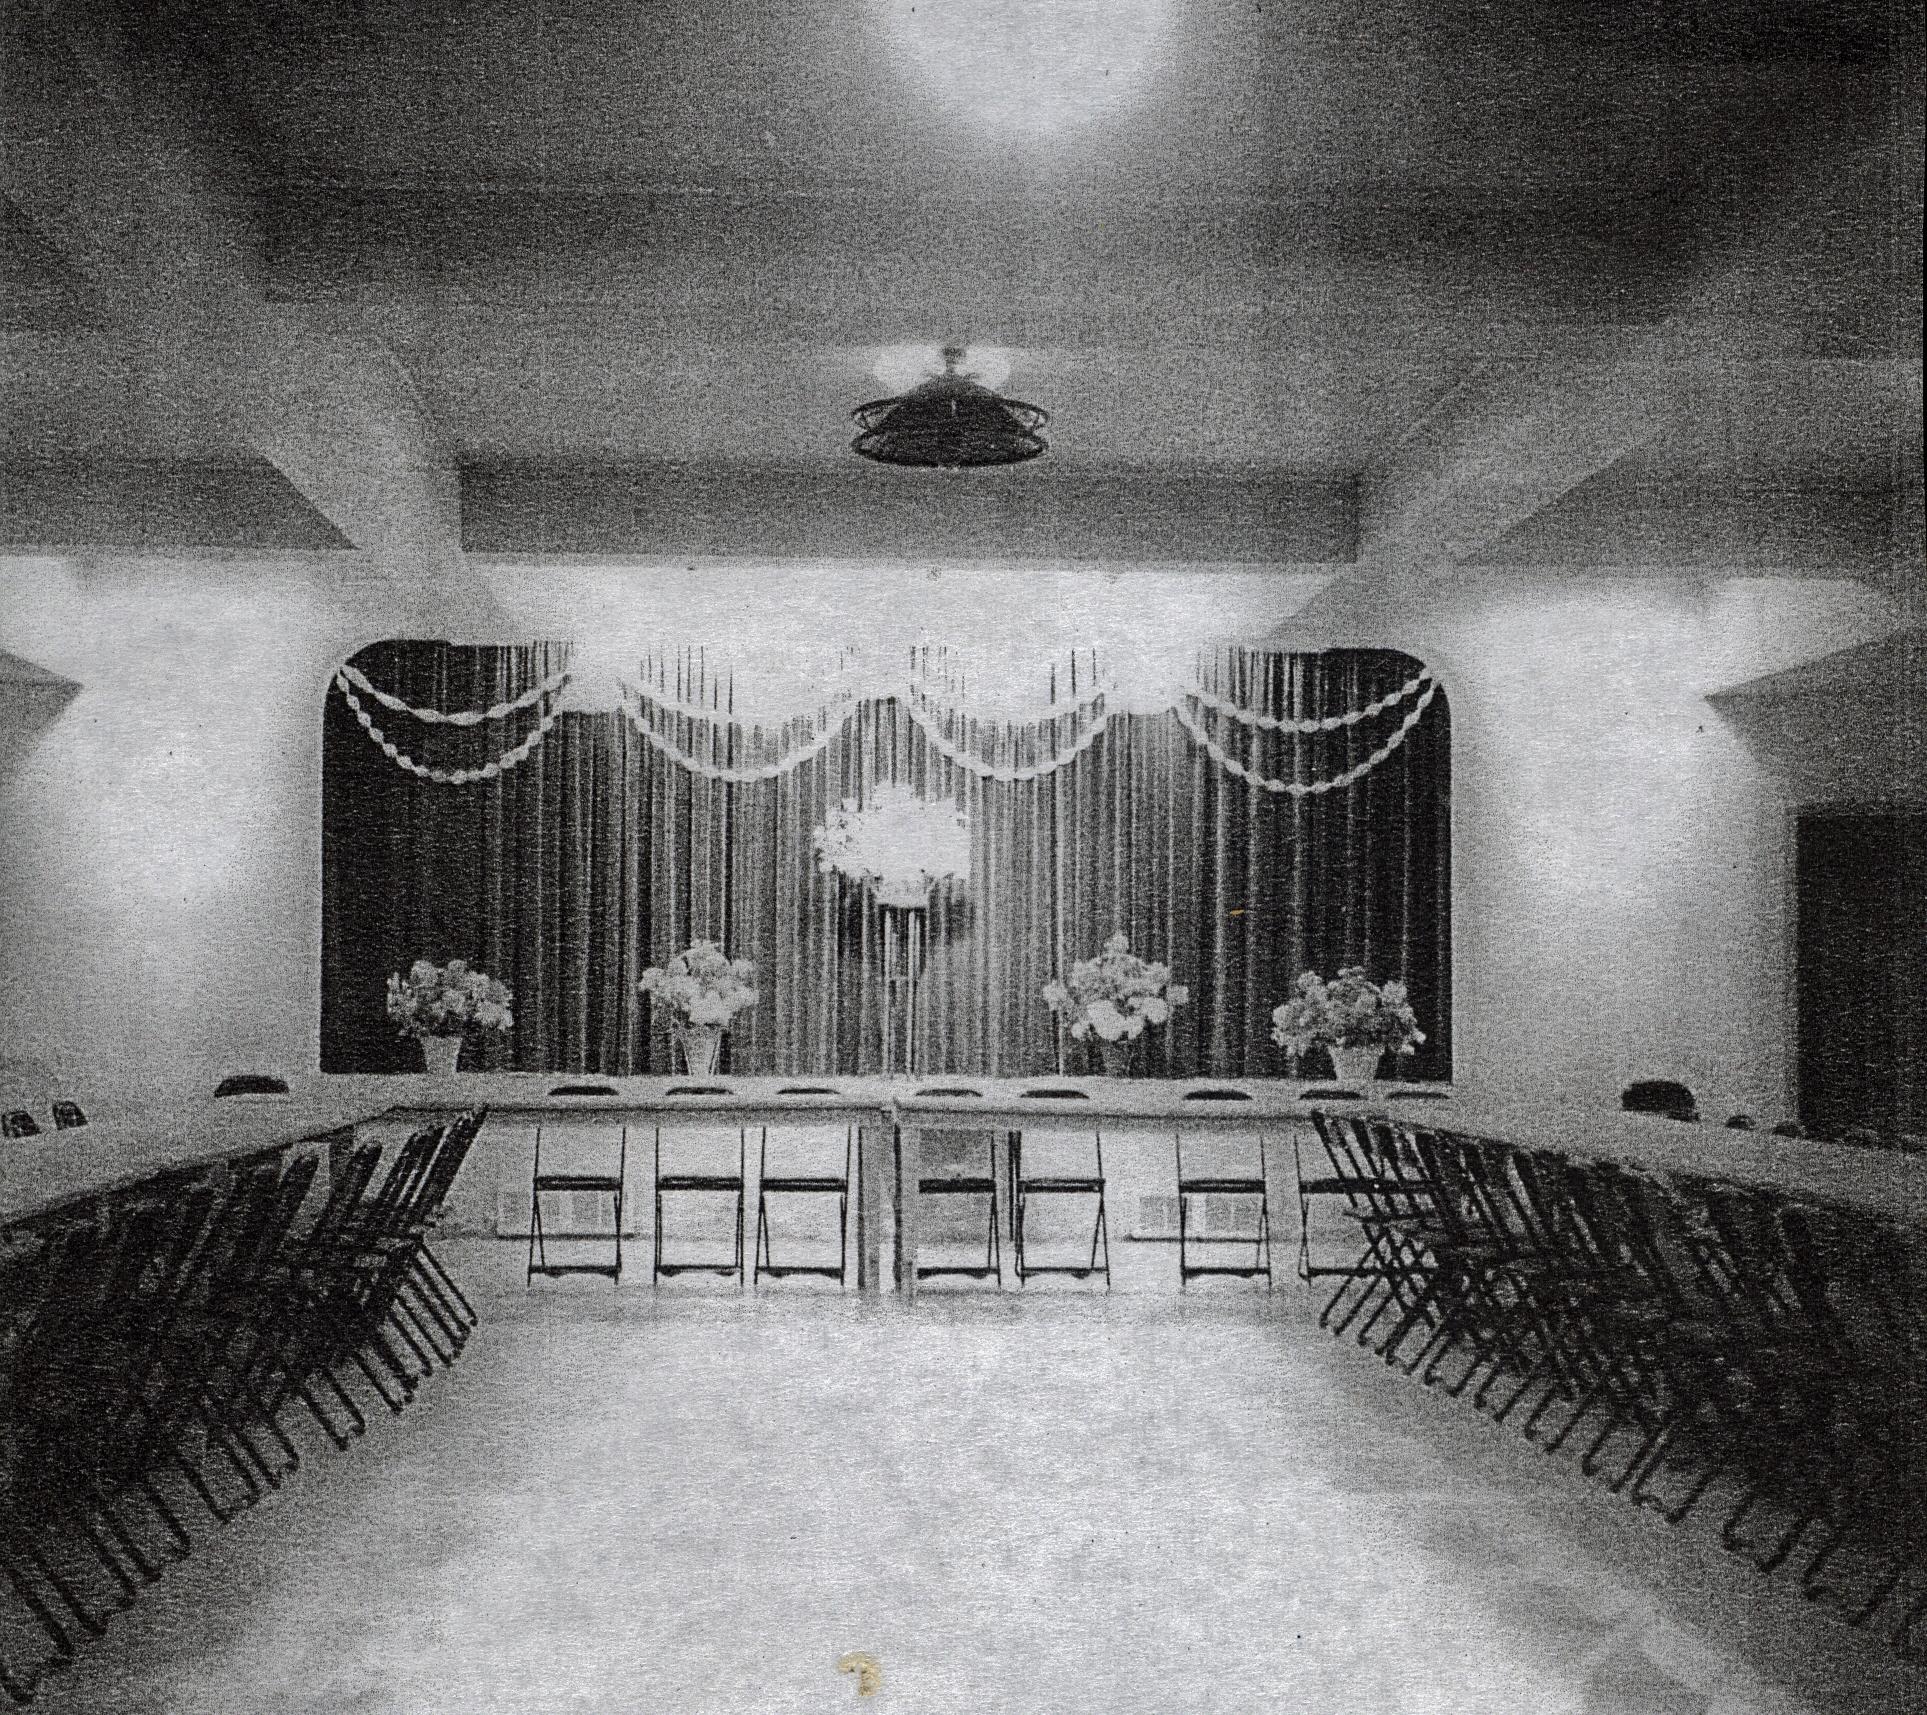 Roman Catholic Church Parish Hall, decorated for wedding of Bernard Doyle and Mary Shannon